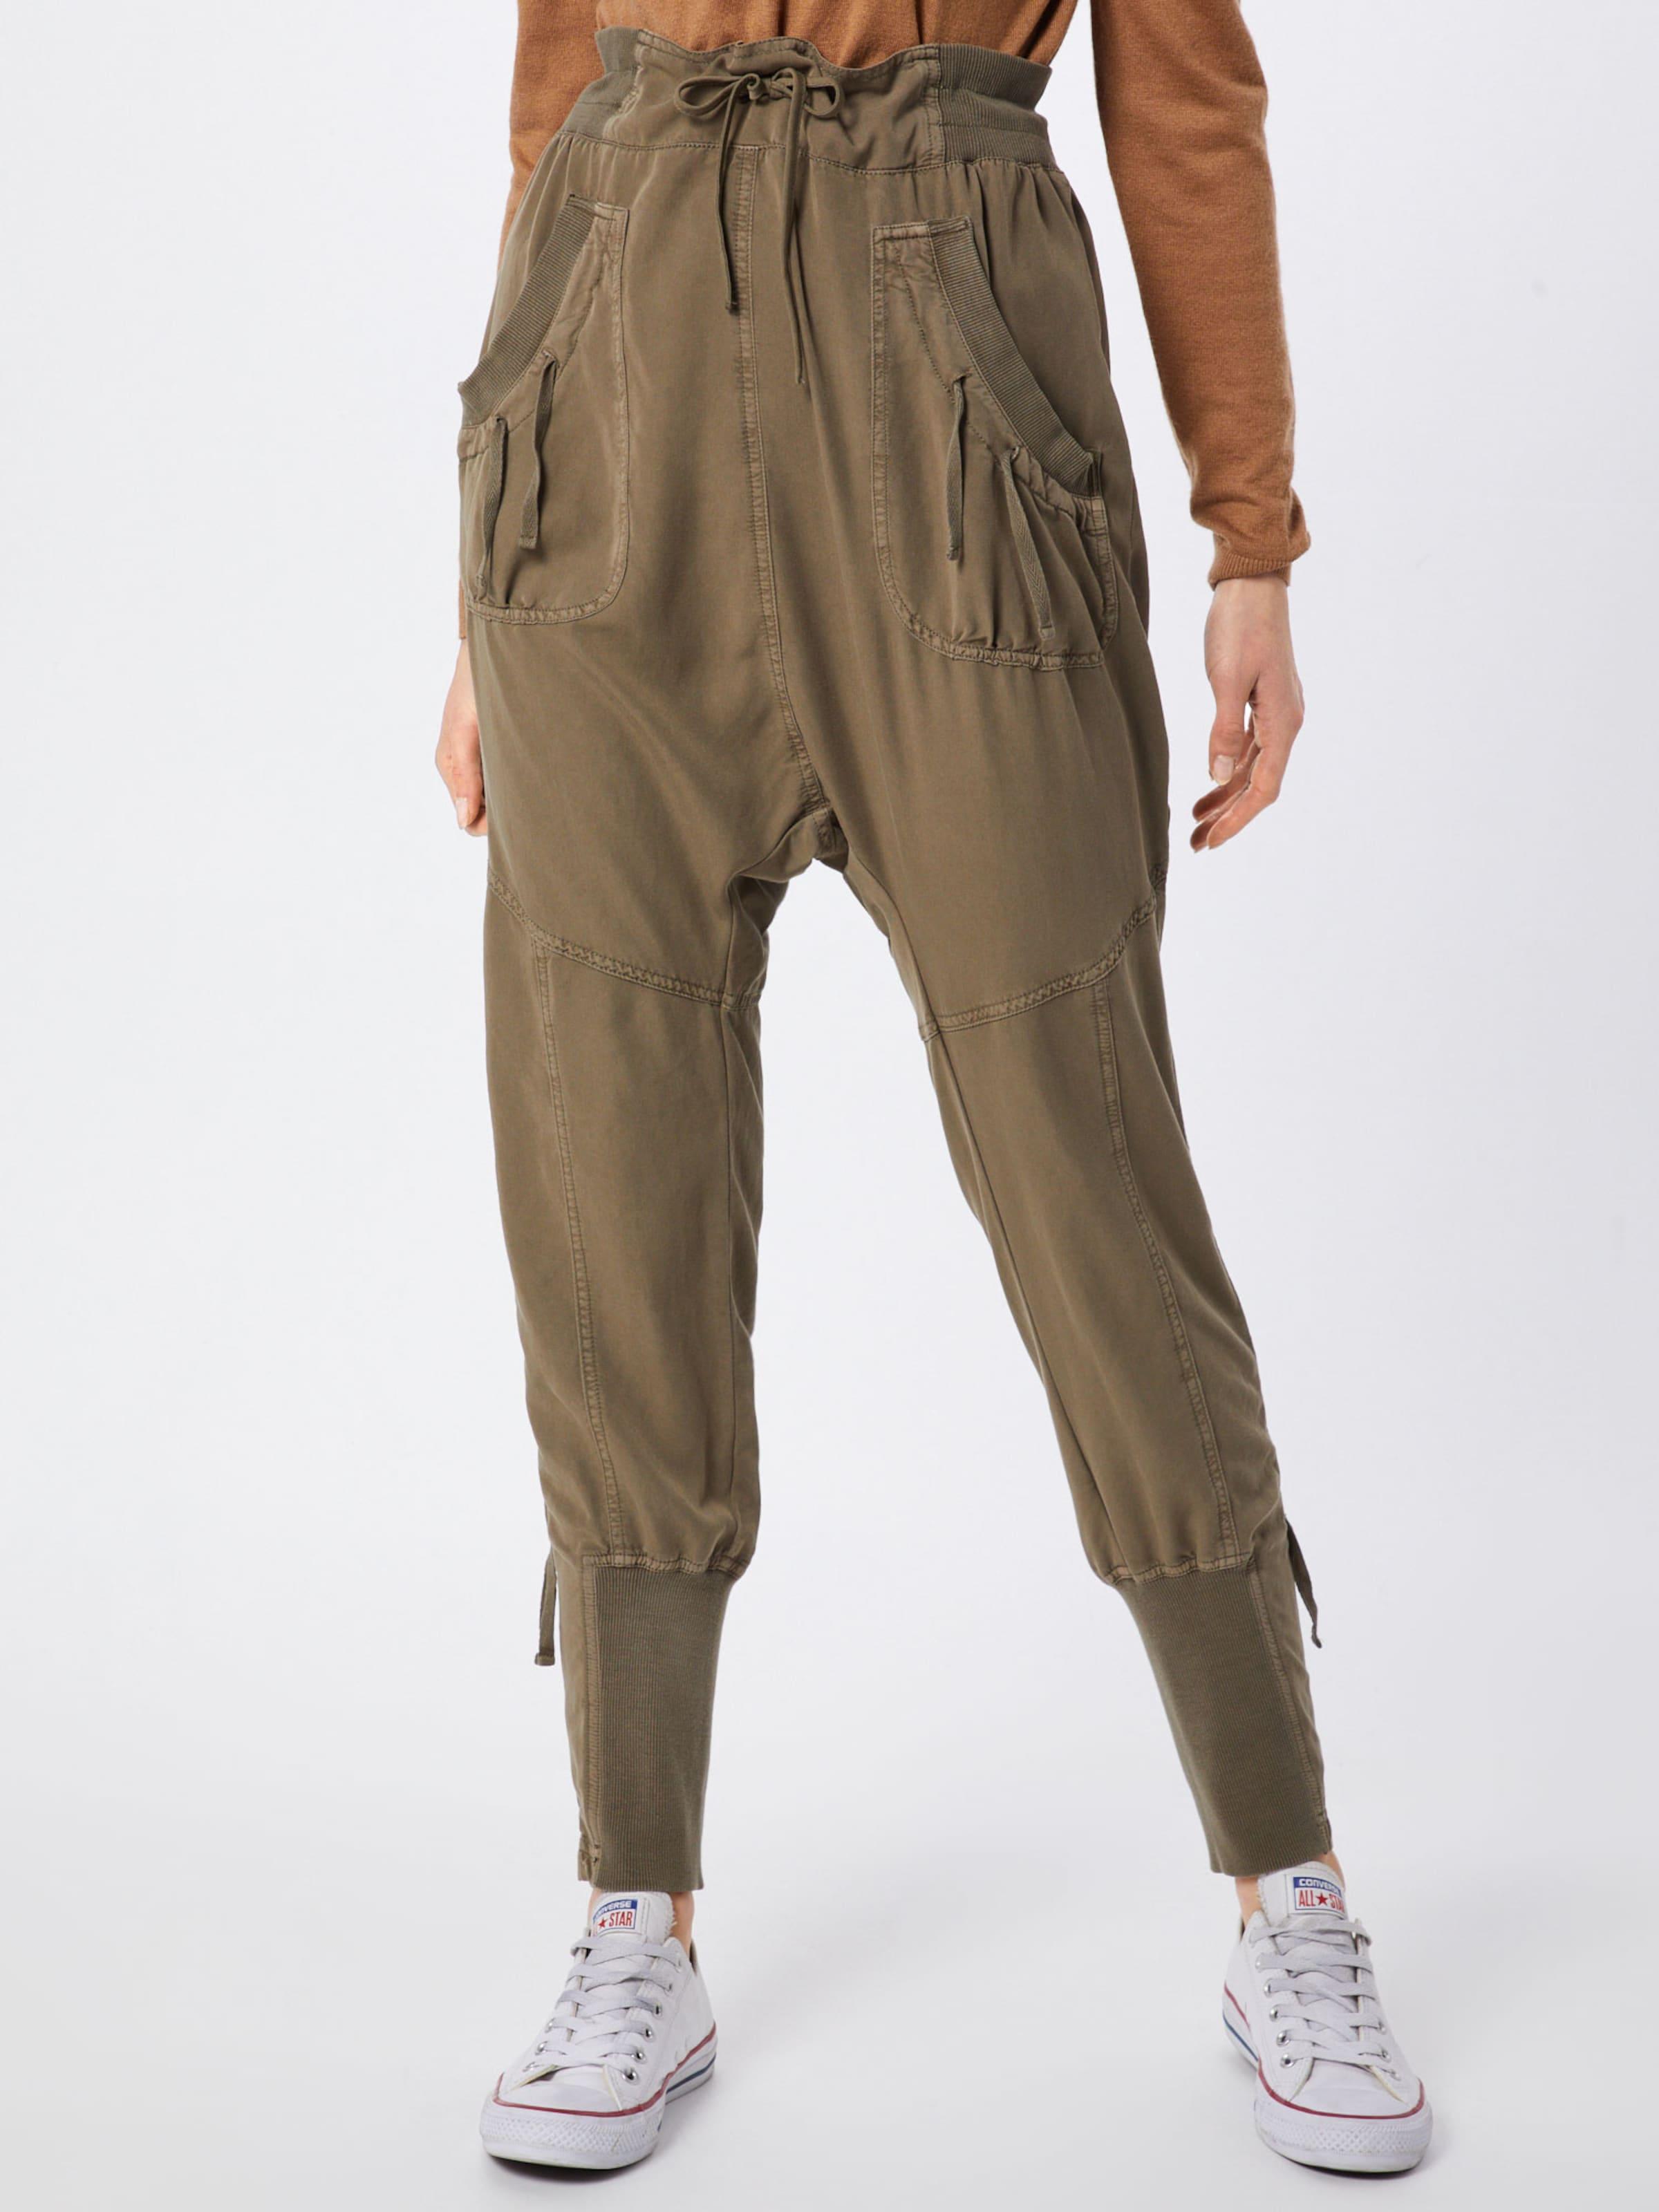 Pantalon Pantalon En Cream Pantalon 'nanna' Kaki Cream 'nanna' Kaki En Cream hrtsQCd